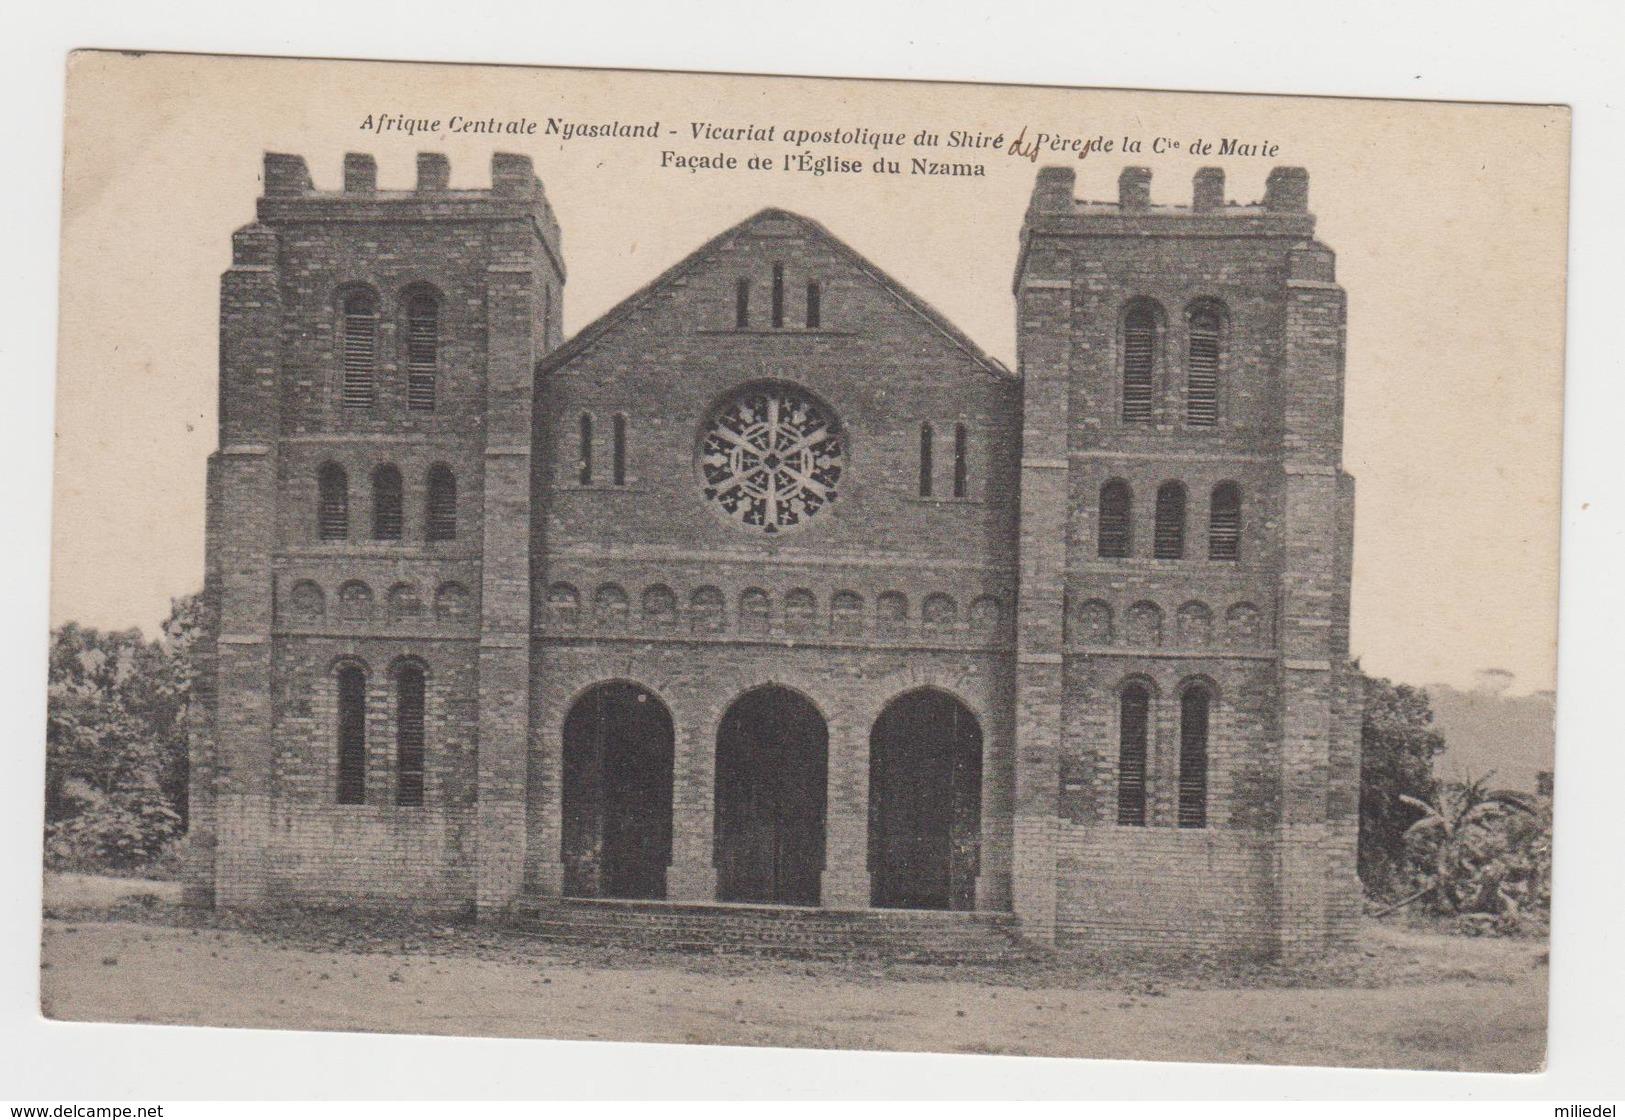 OR266 - Afrique Centrale Nyasaland - Vicariat Apostolique Du Shiré - Façade Eglise Du NZAMA - Malawi